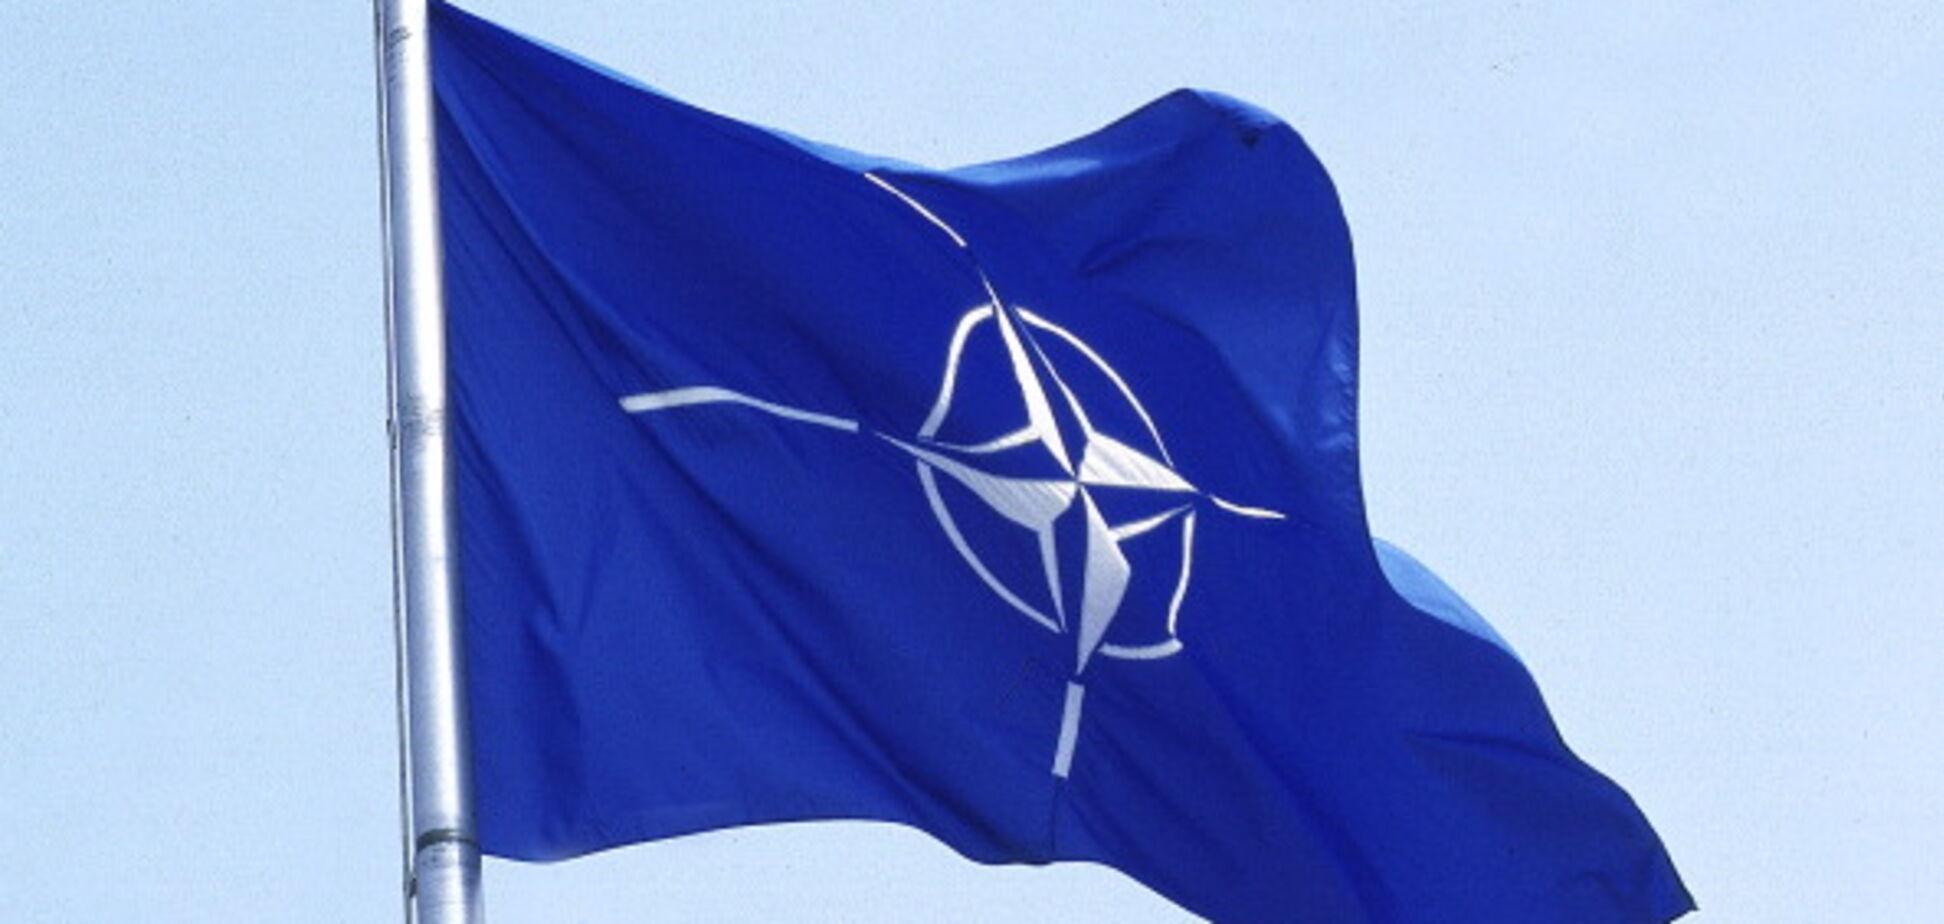 МИД РФ: НАТО перешла 'красную линию', ситуация обострилась